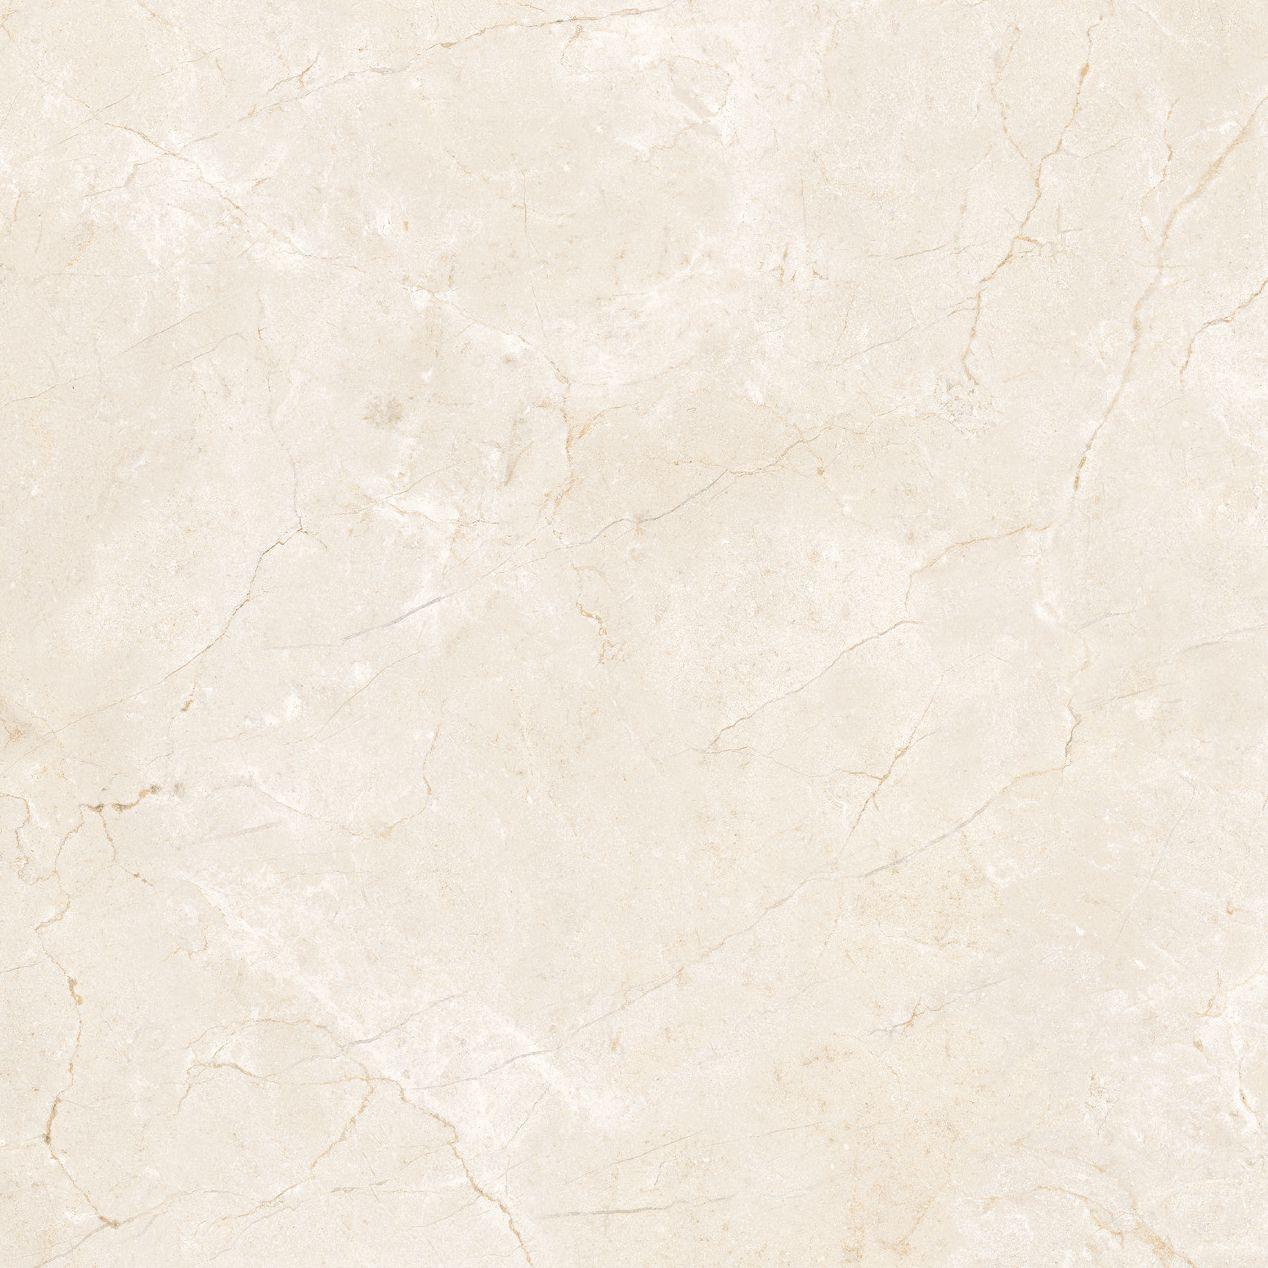 Elegant Stone Crema Marfil Porcelain Tile Marble Tiles Texture Porcelain Floor Tiles Elegant Stone